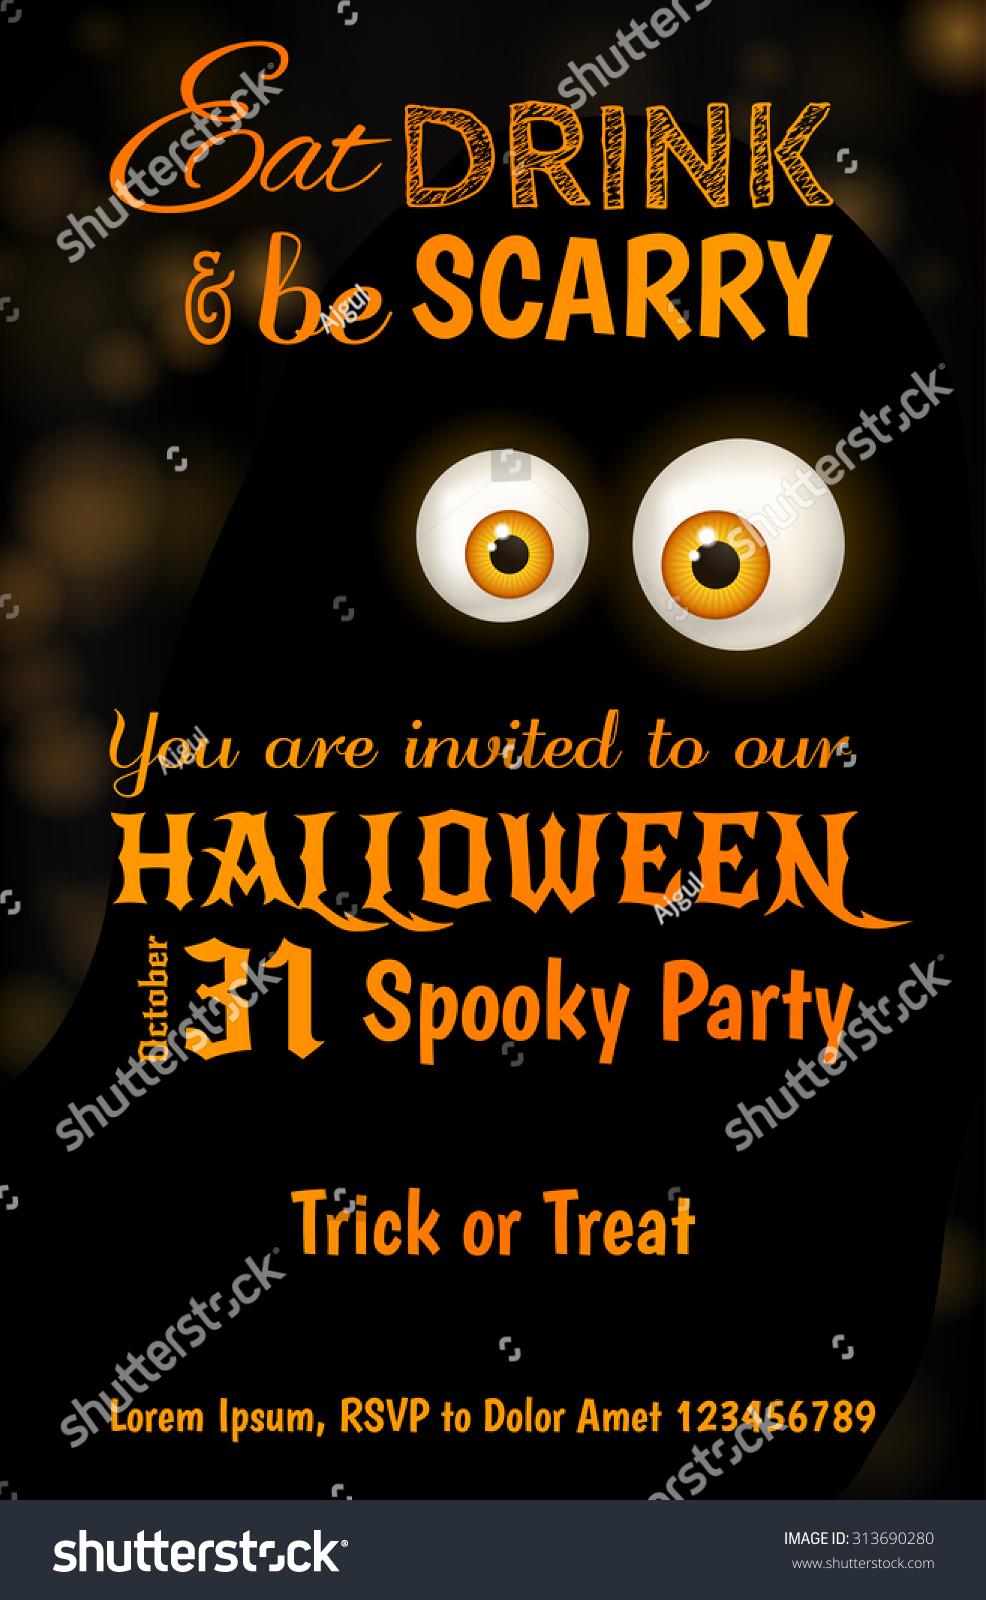 Invitation Design Halloween Party Scary Big Stock Vector 313690280 ...